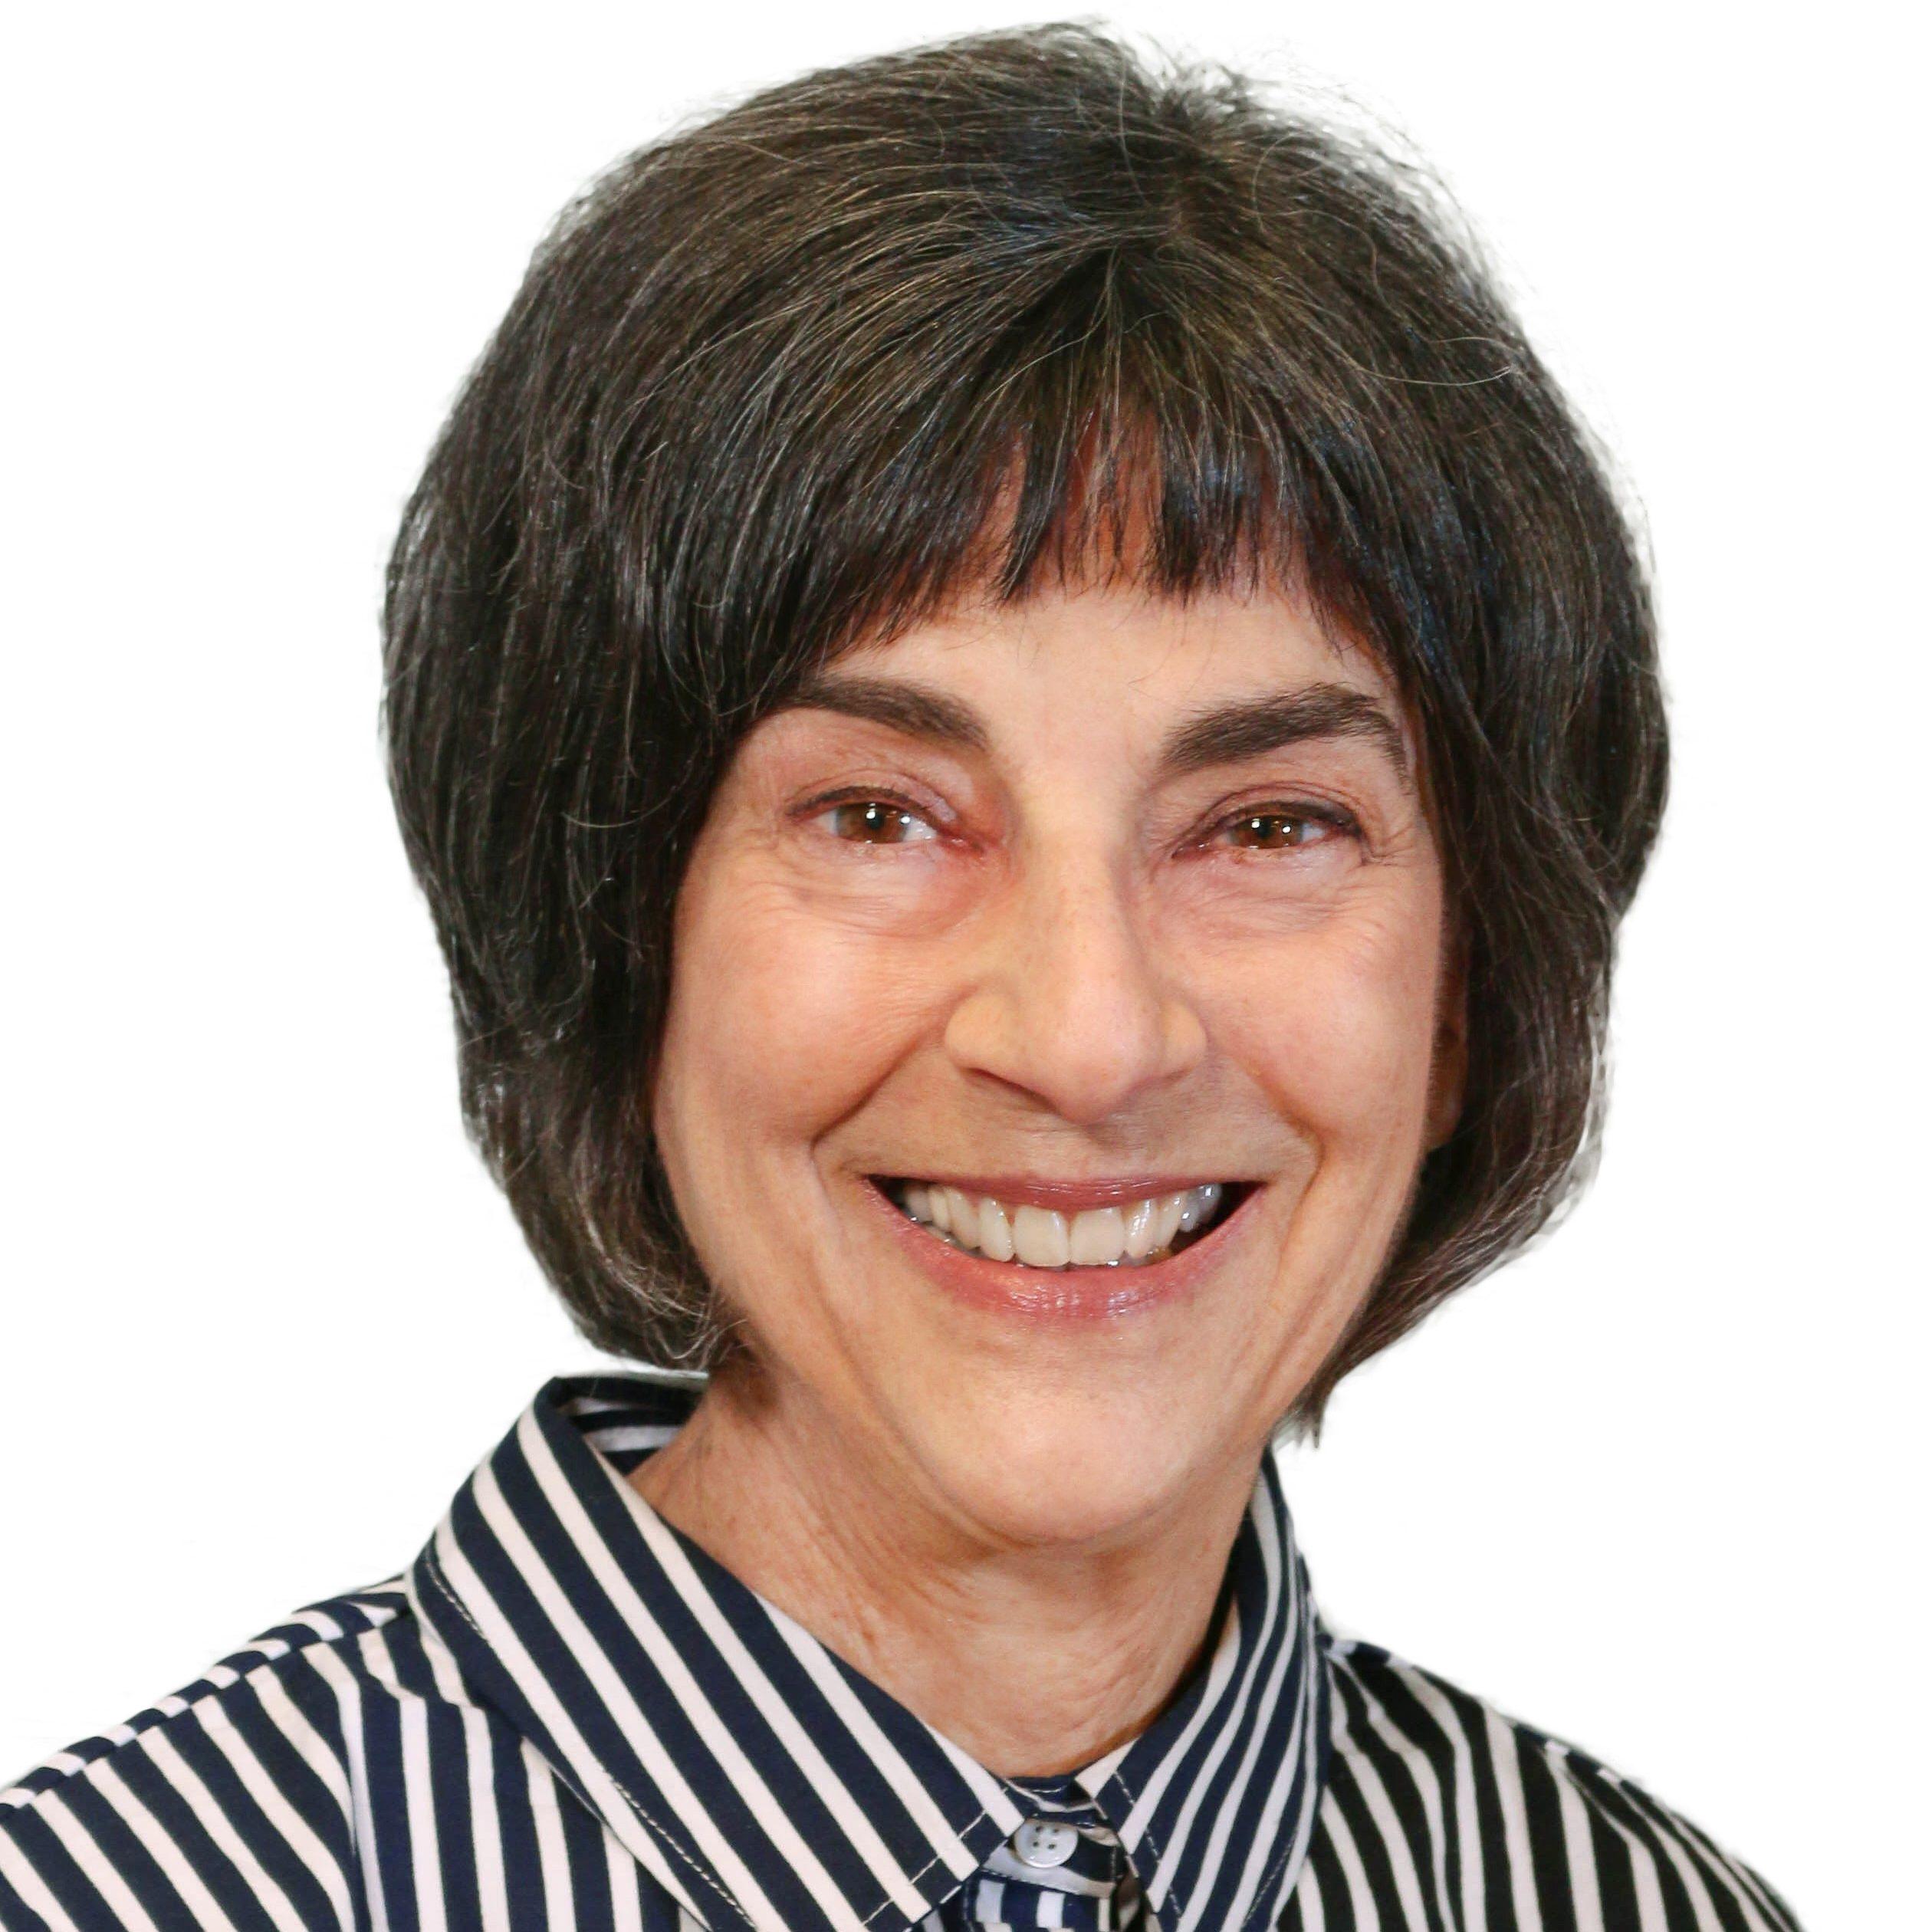 Janice Schwartz